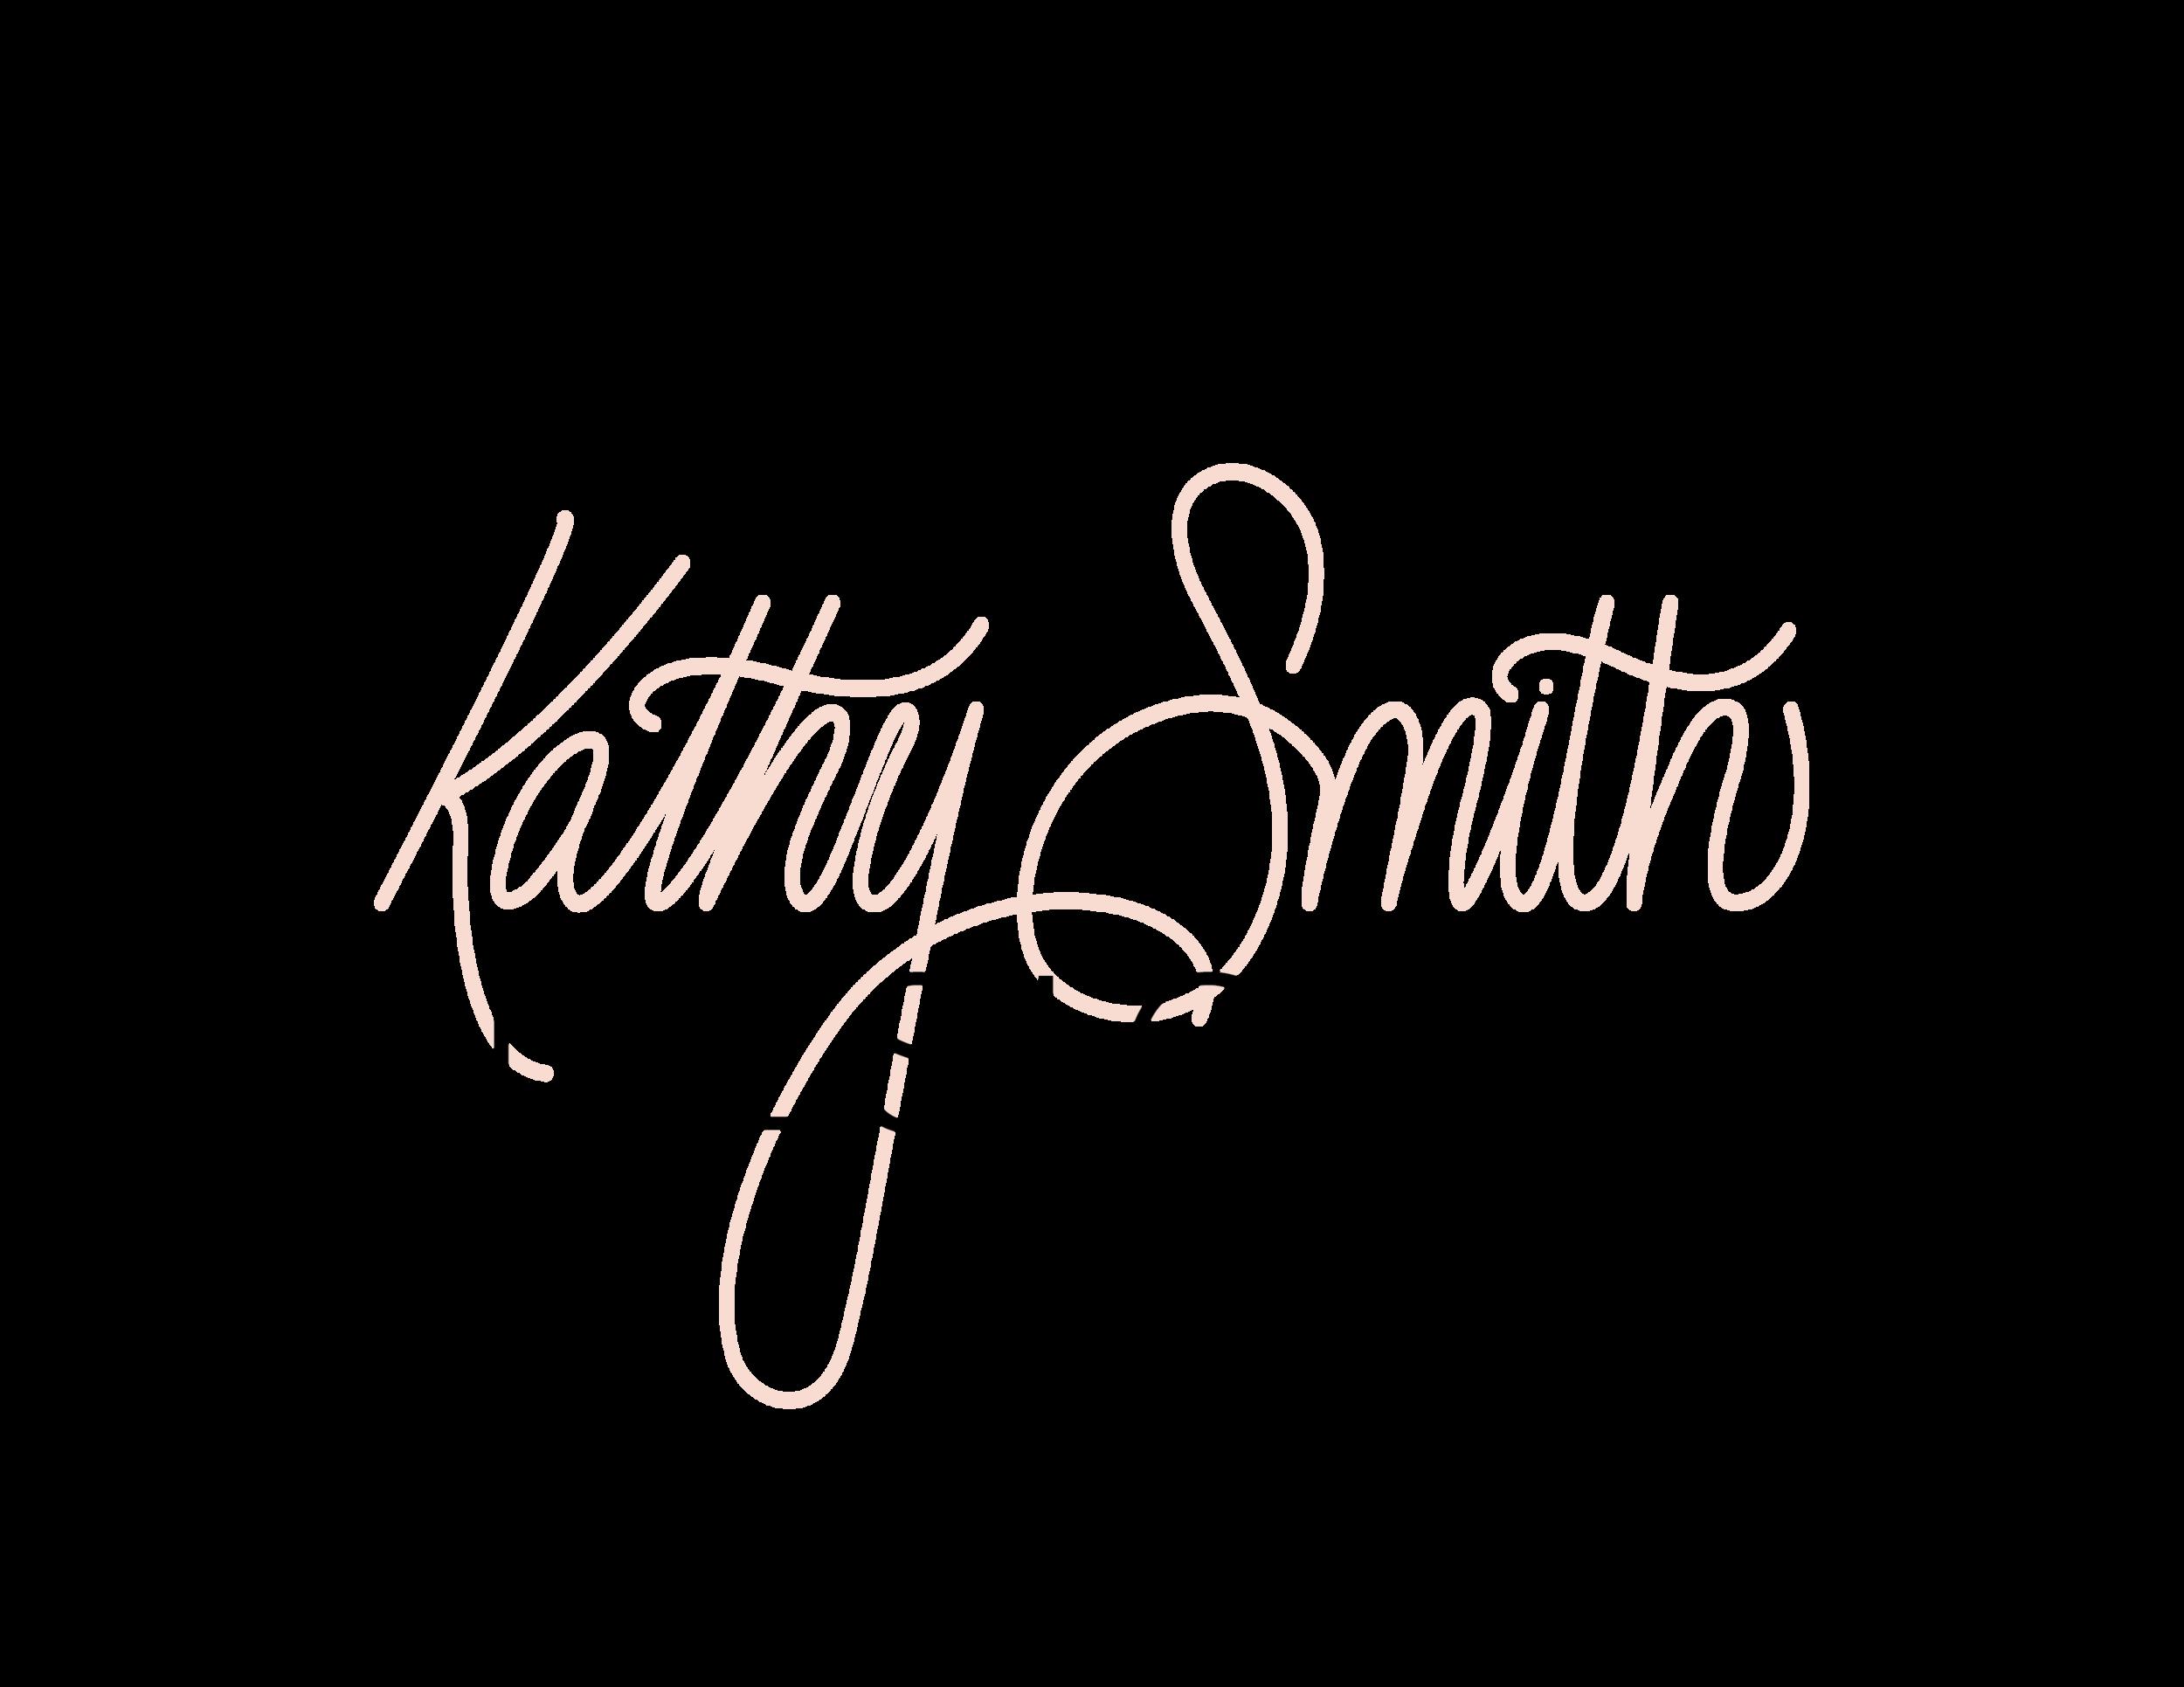 Kathy Smith Logo-15.png